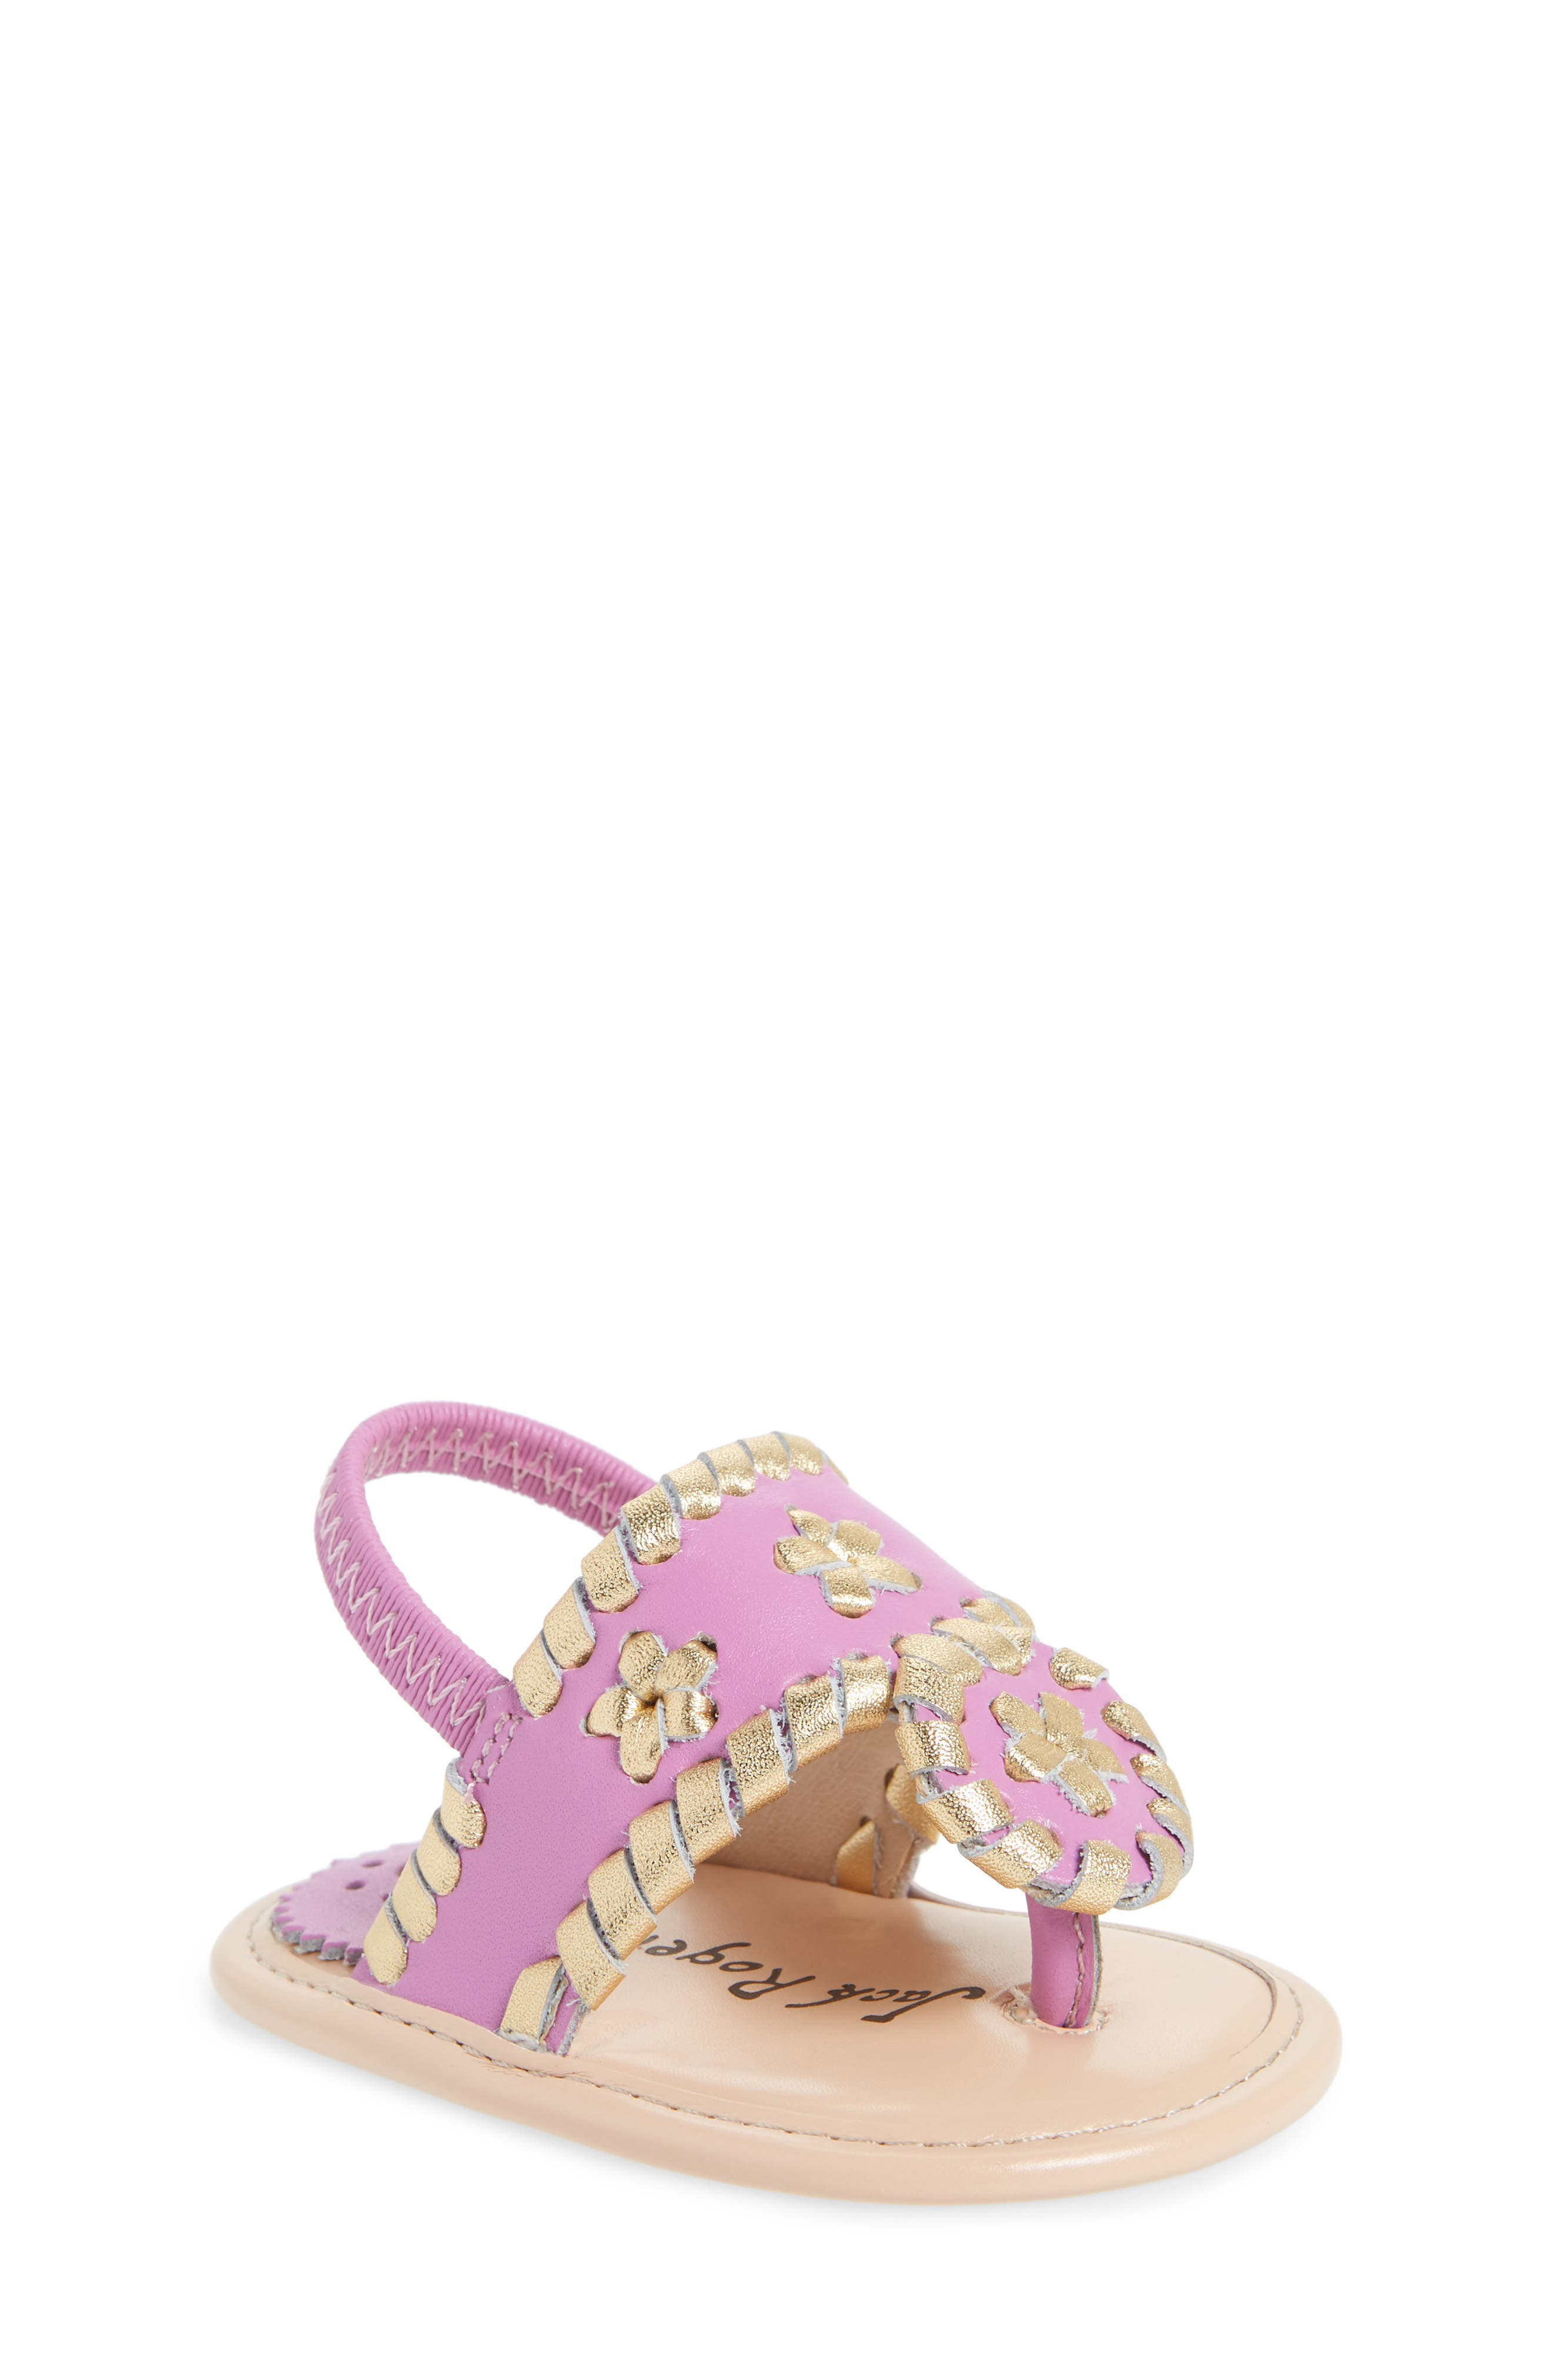 Hollis Sandal,                             Main thumbnail 1, color,                             Lavender Pink/ Gold Leather